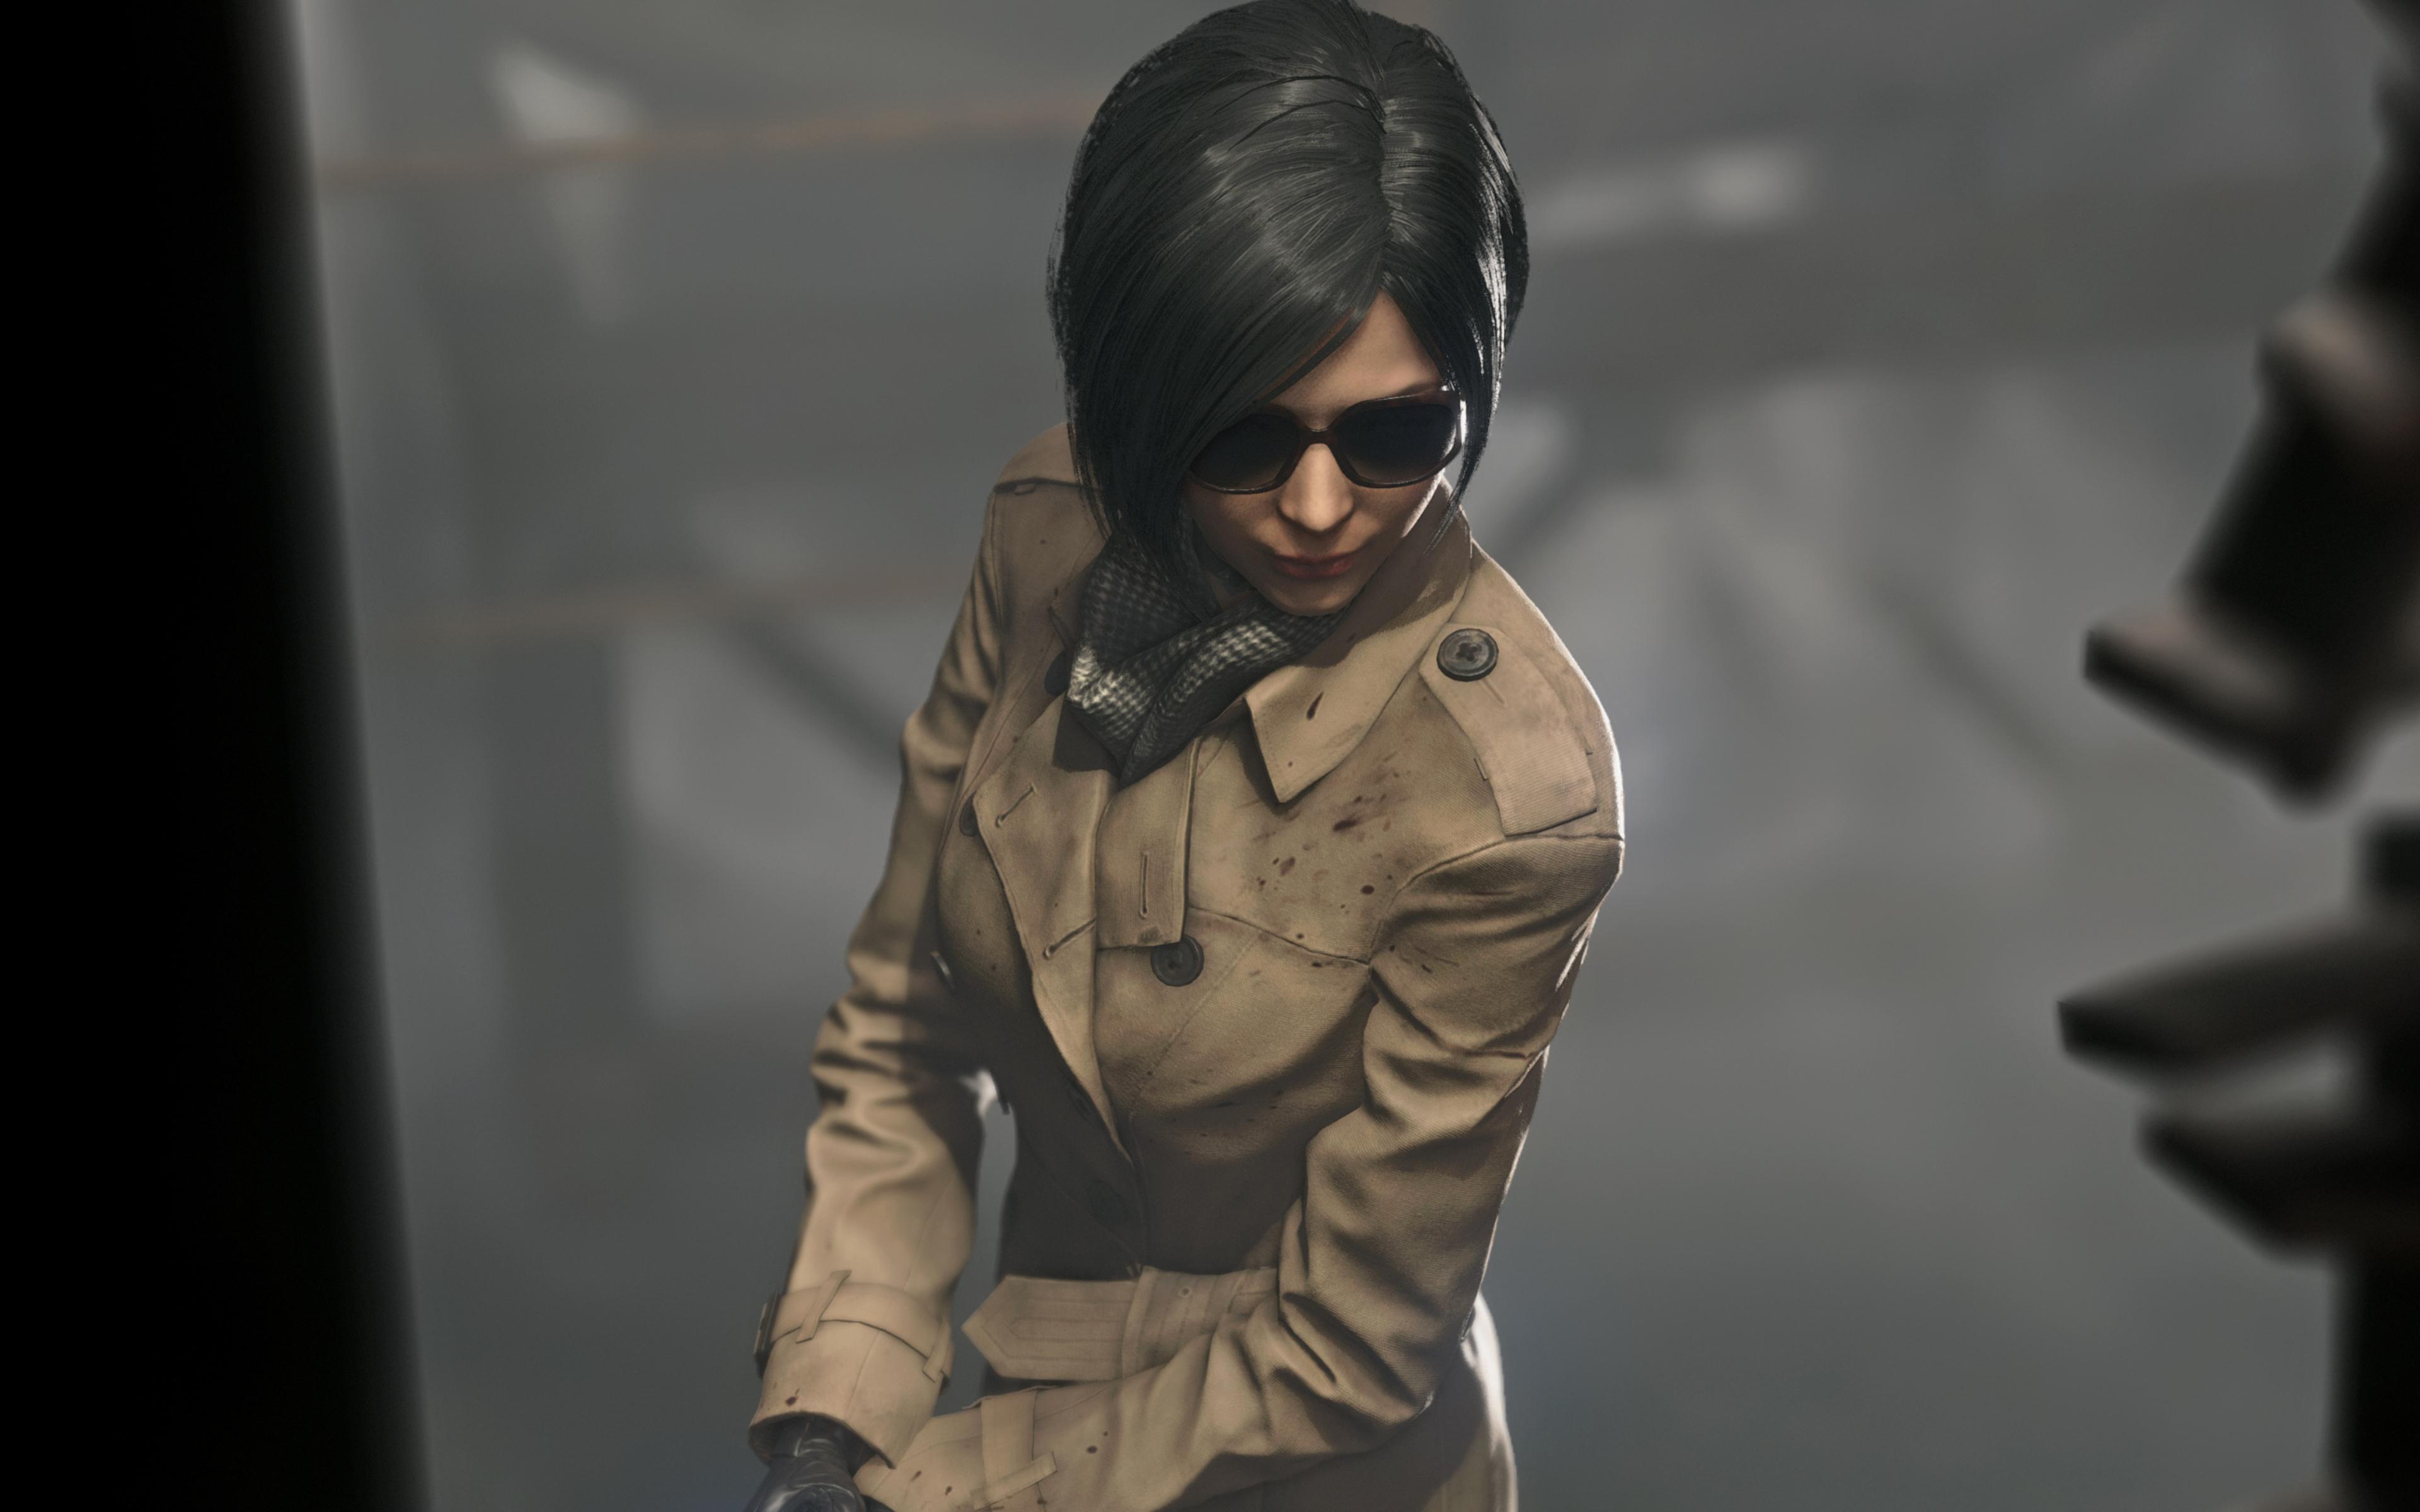 3840x2400 Ada Wong In Resident Evil2 4k HD 4k Wallpapers ...